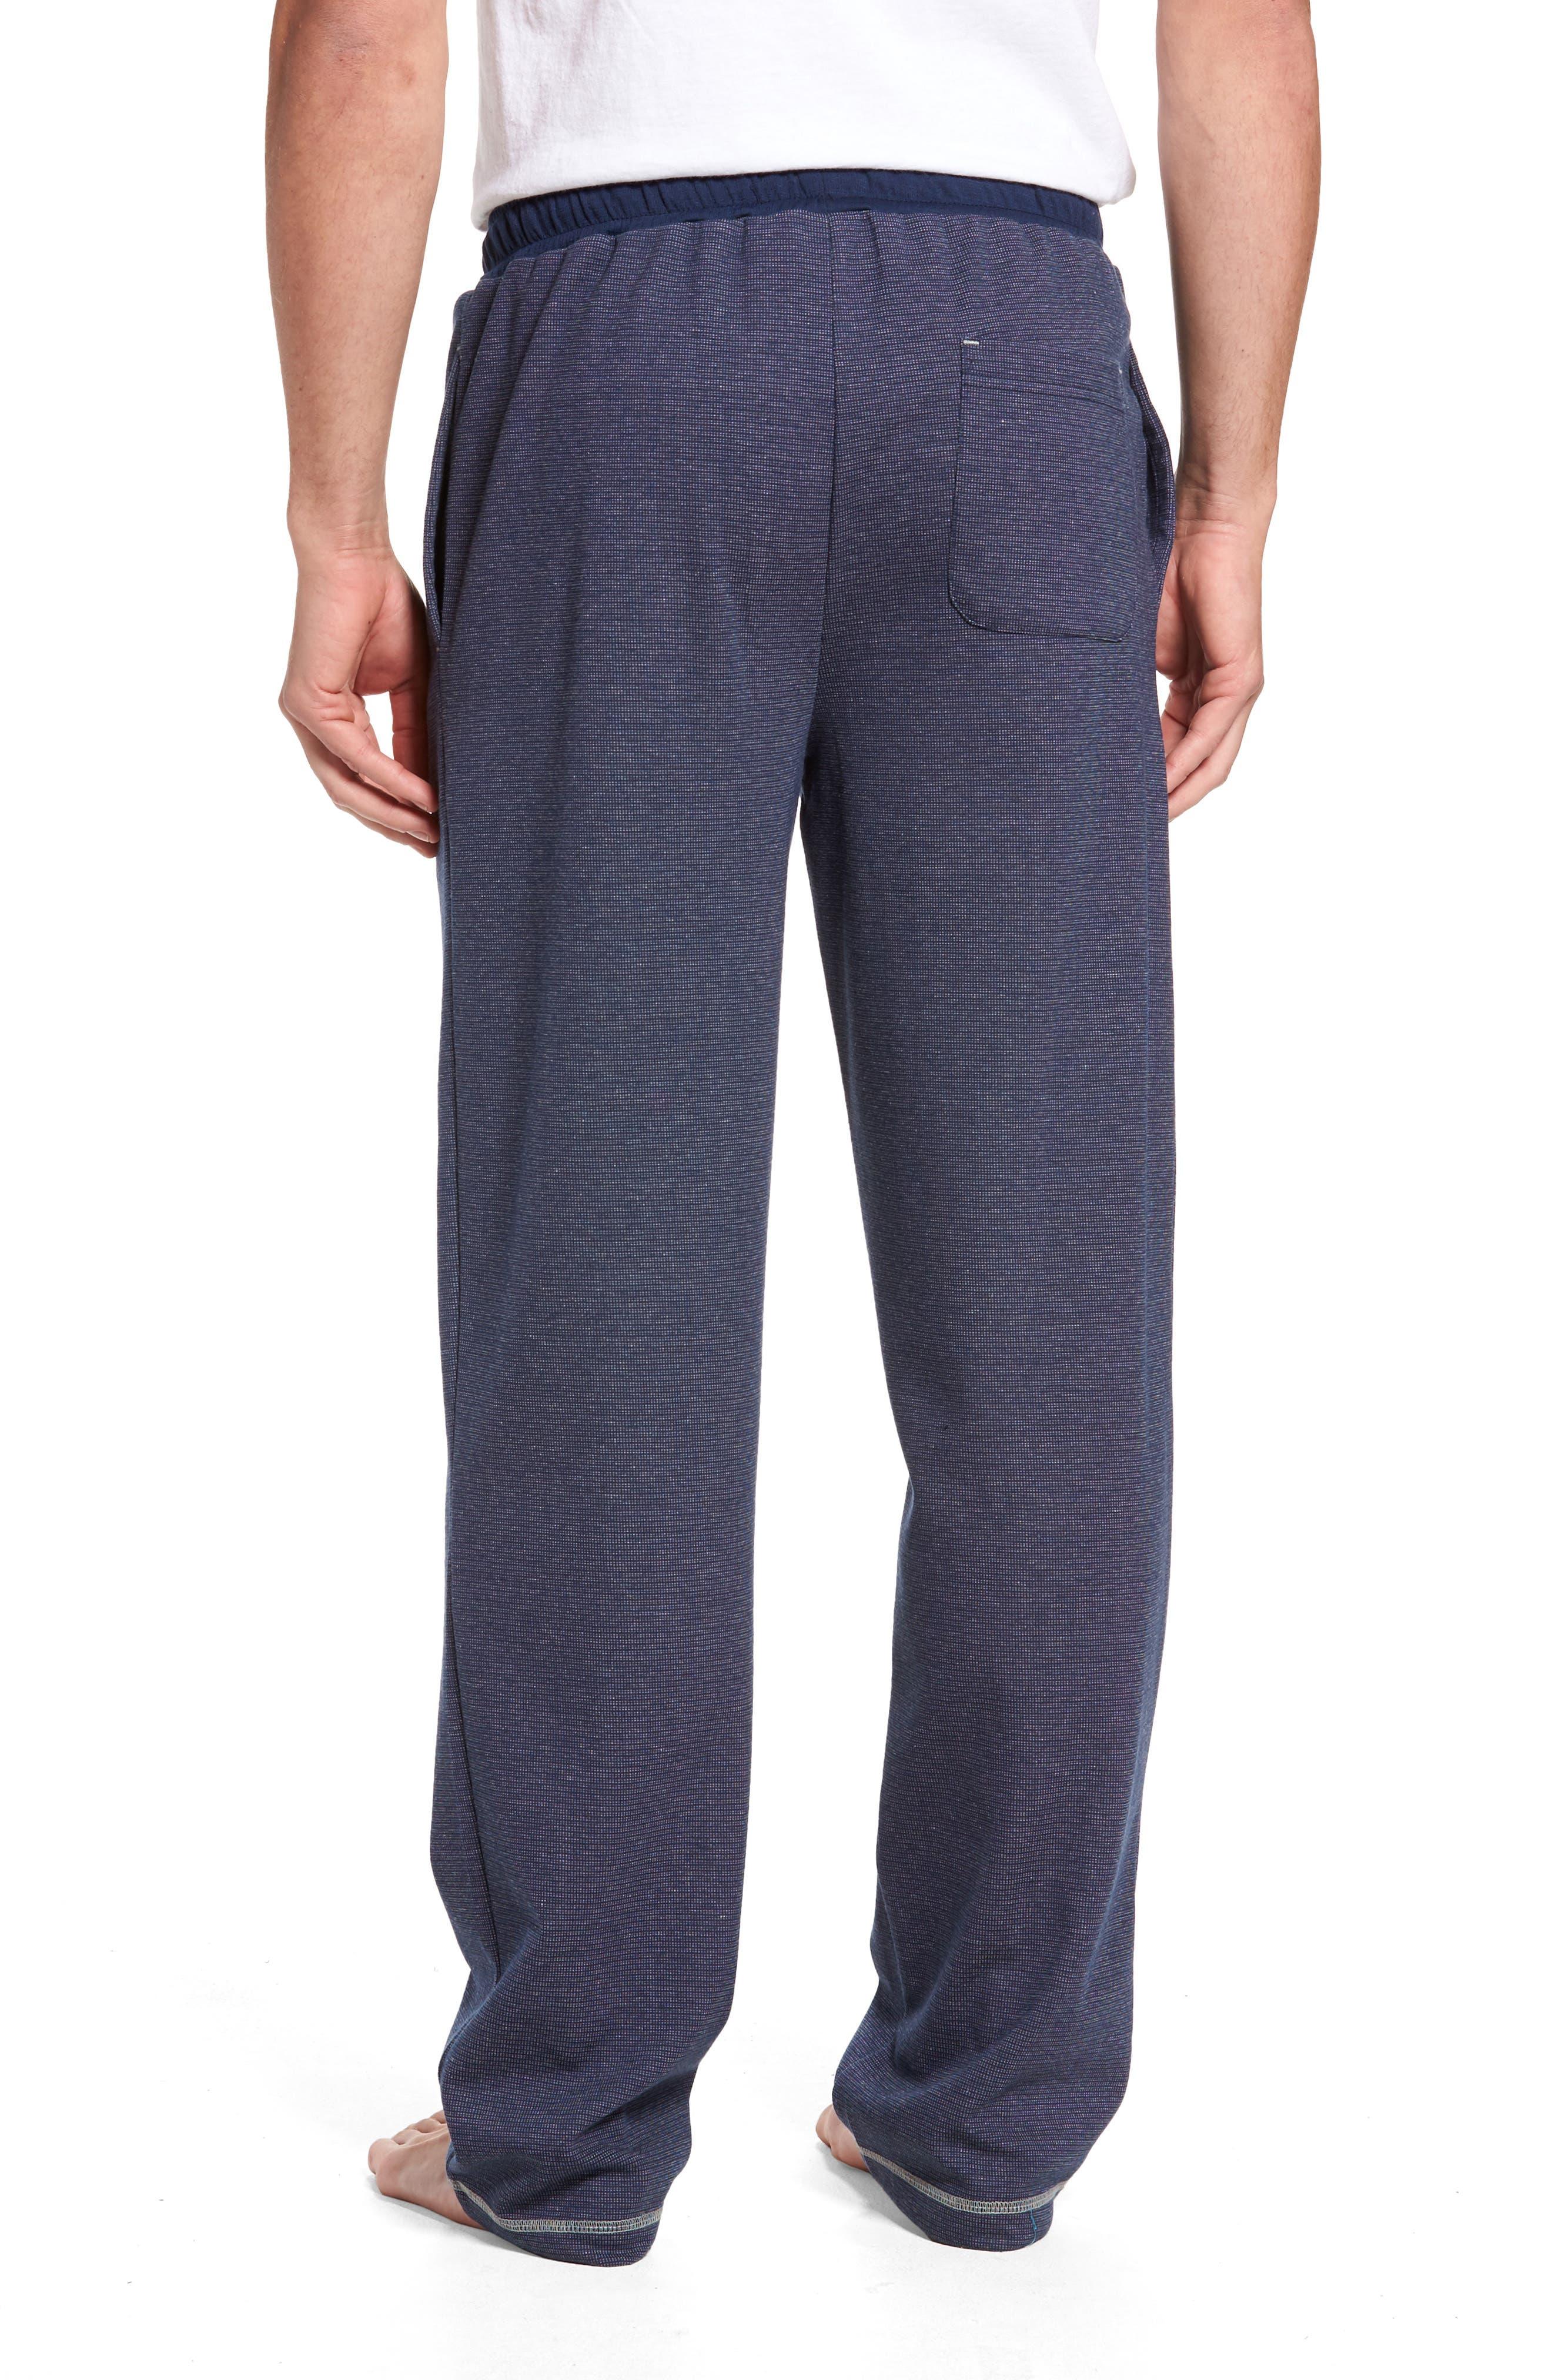 Lodge Layers Lounge Pants,                             Alternate thumbnail 2, color,                             Navy